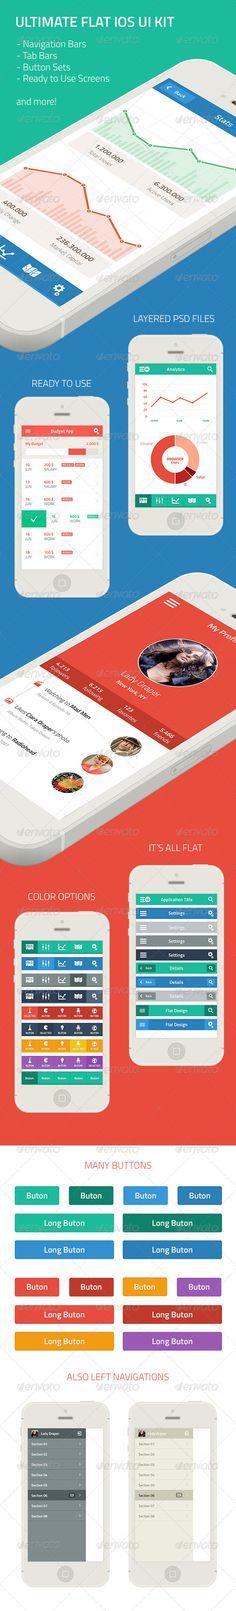 app     application     apps     button     clean     flat     flat ui     gui     ios     ipad     iphone     iphone 4     iphone 5     kit     modern     navigation     navigation bar     retina display     tab bar     touch     trend     ui     user interface